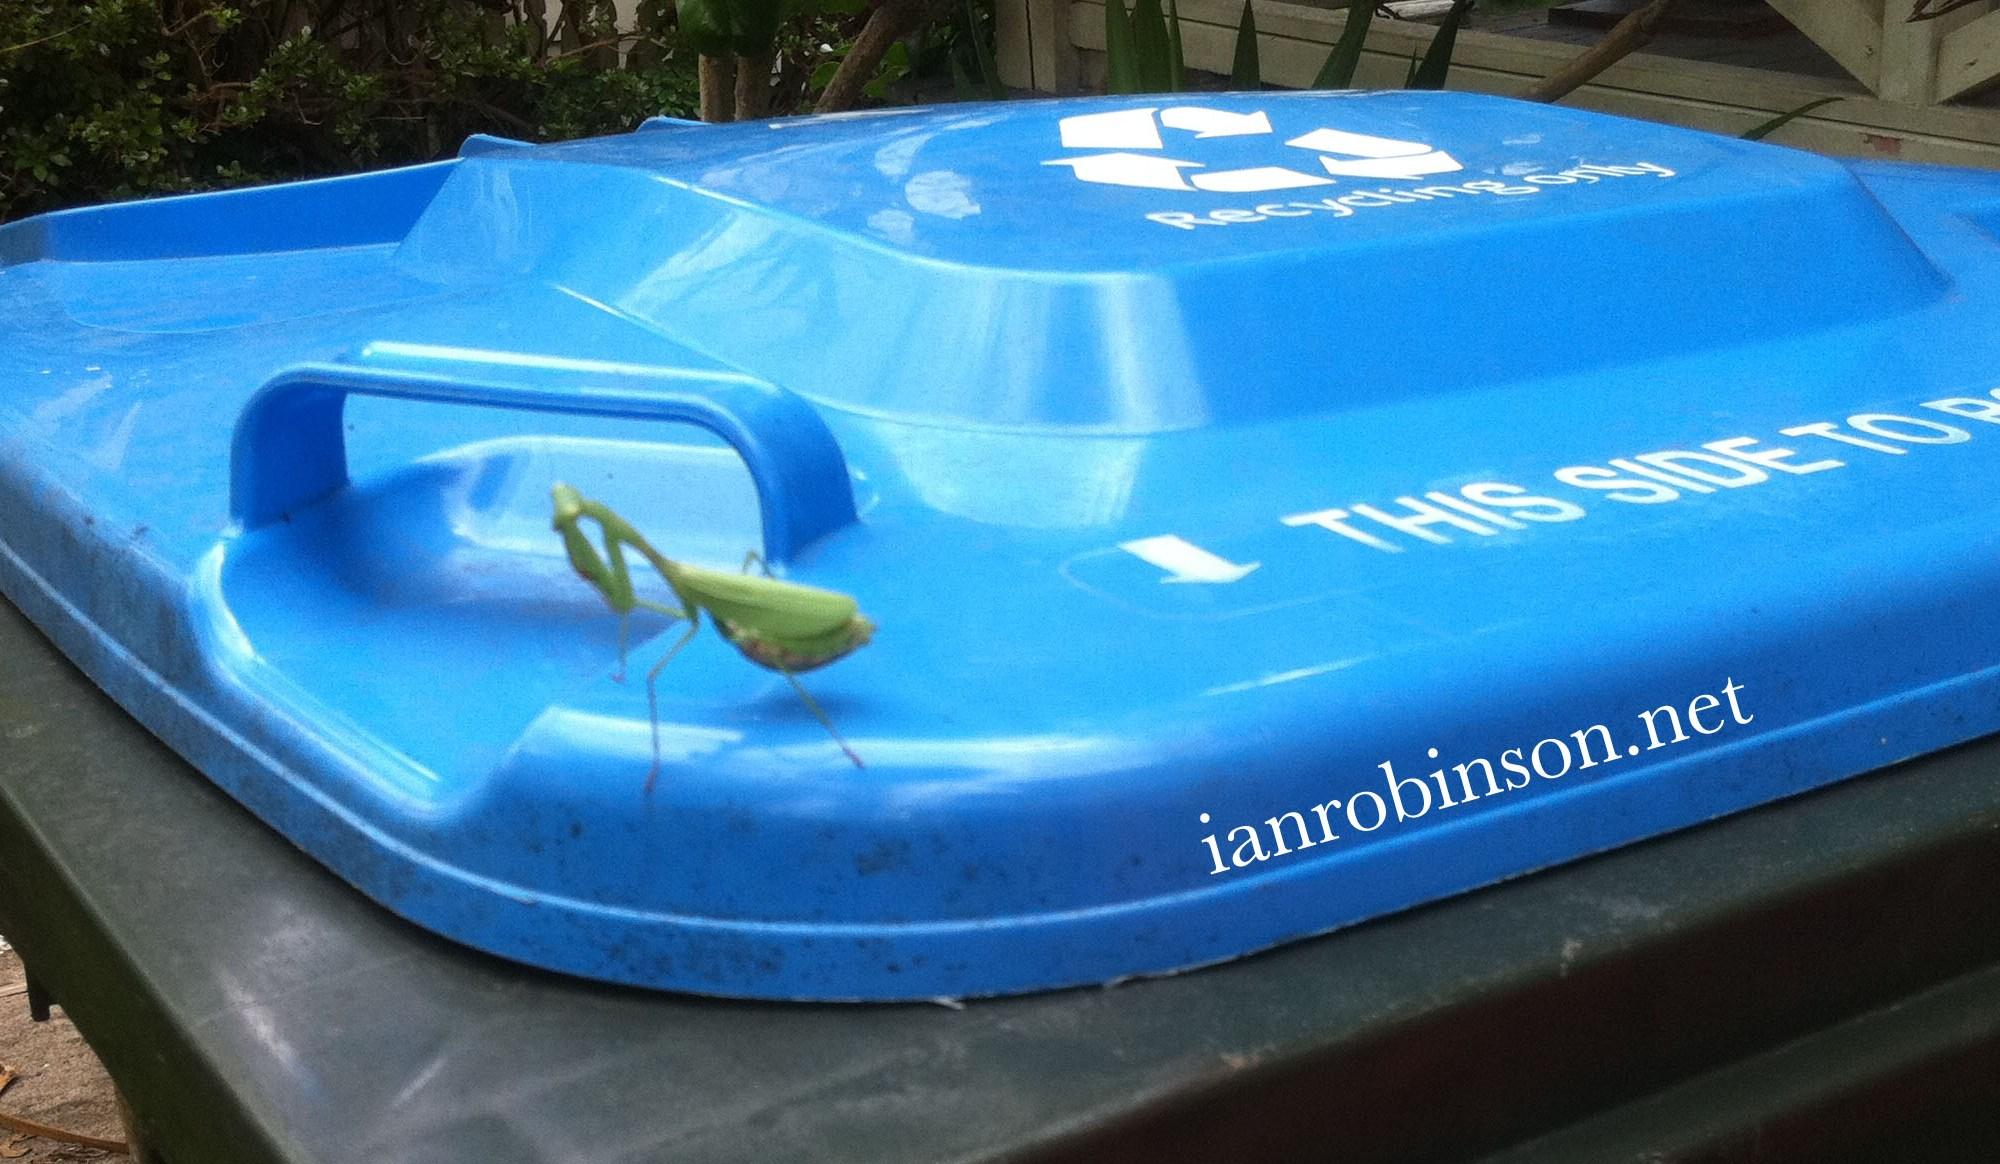 Grasshopper on Recycling